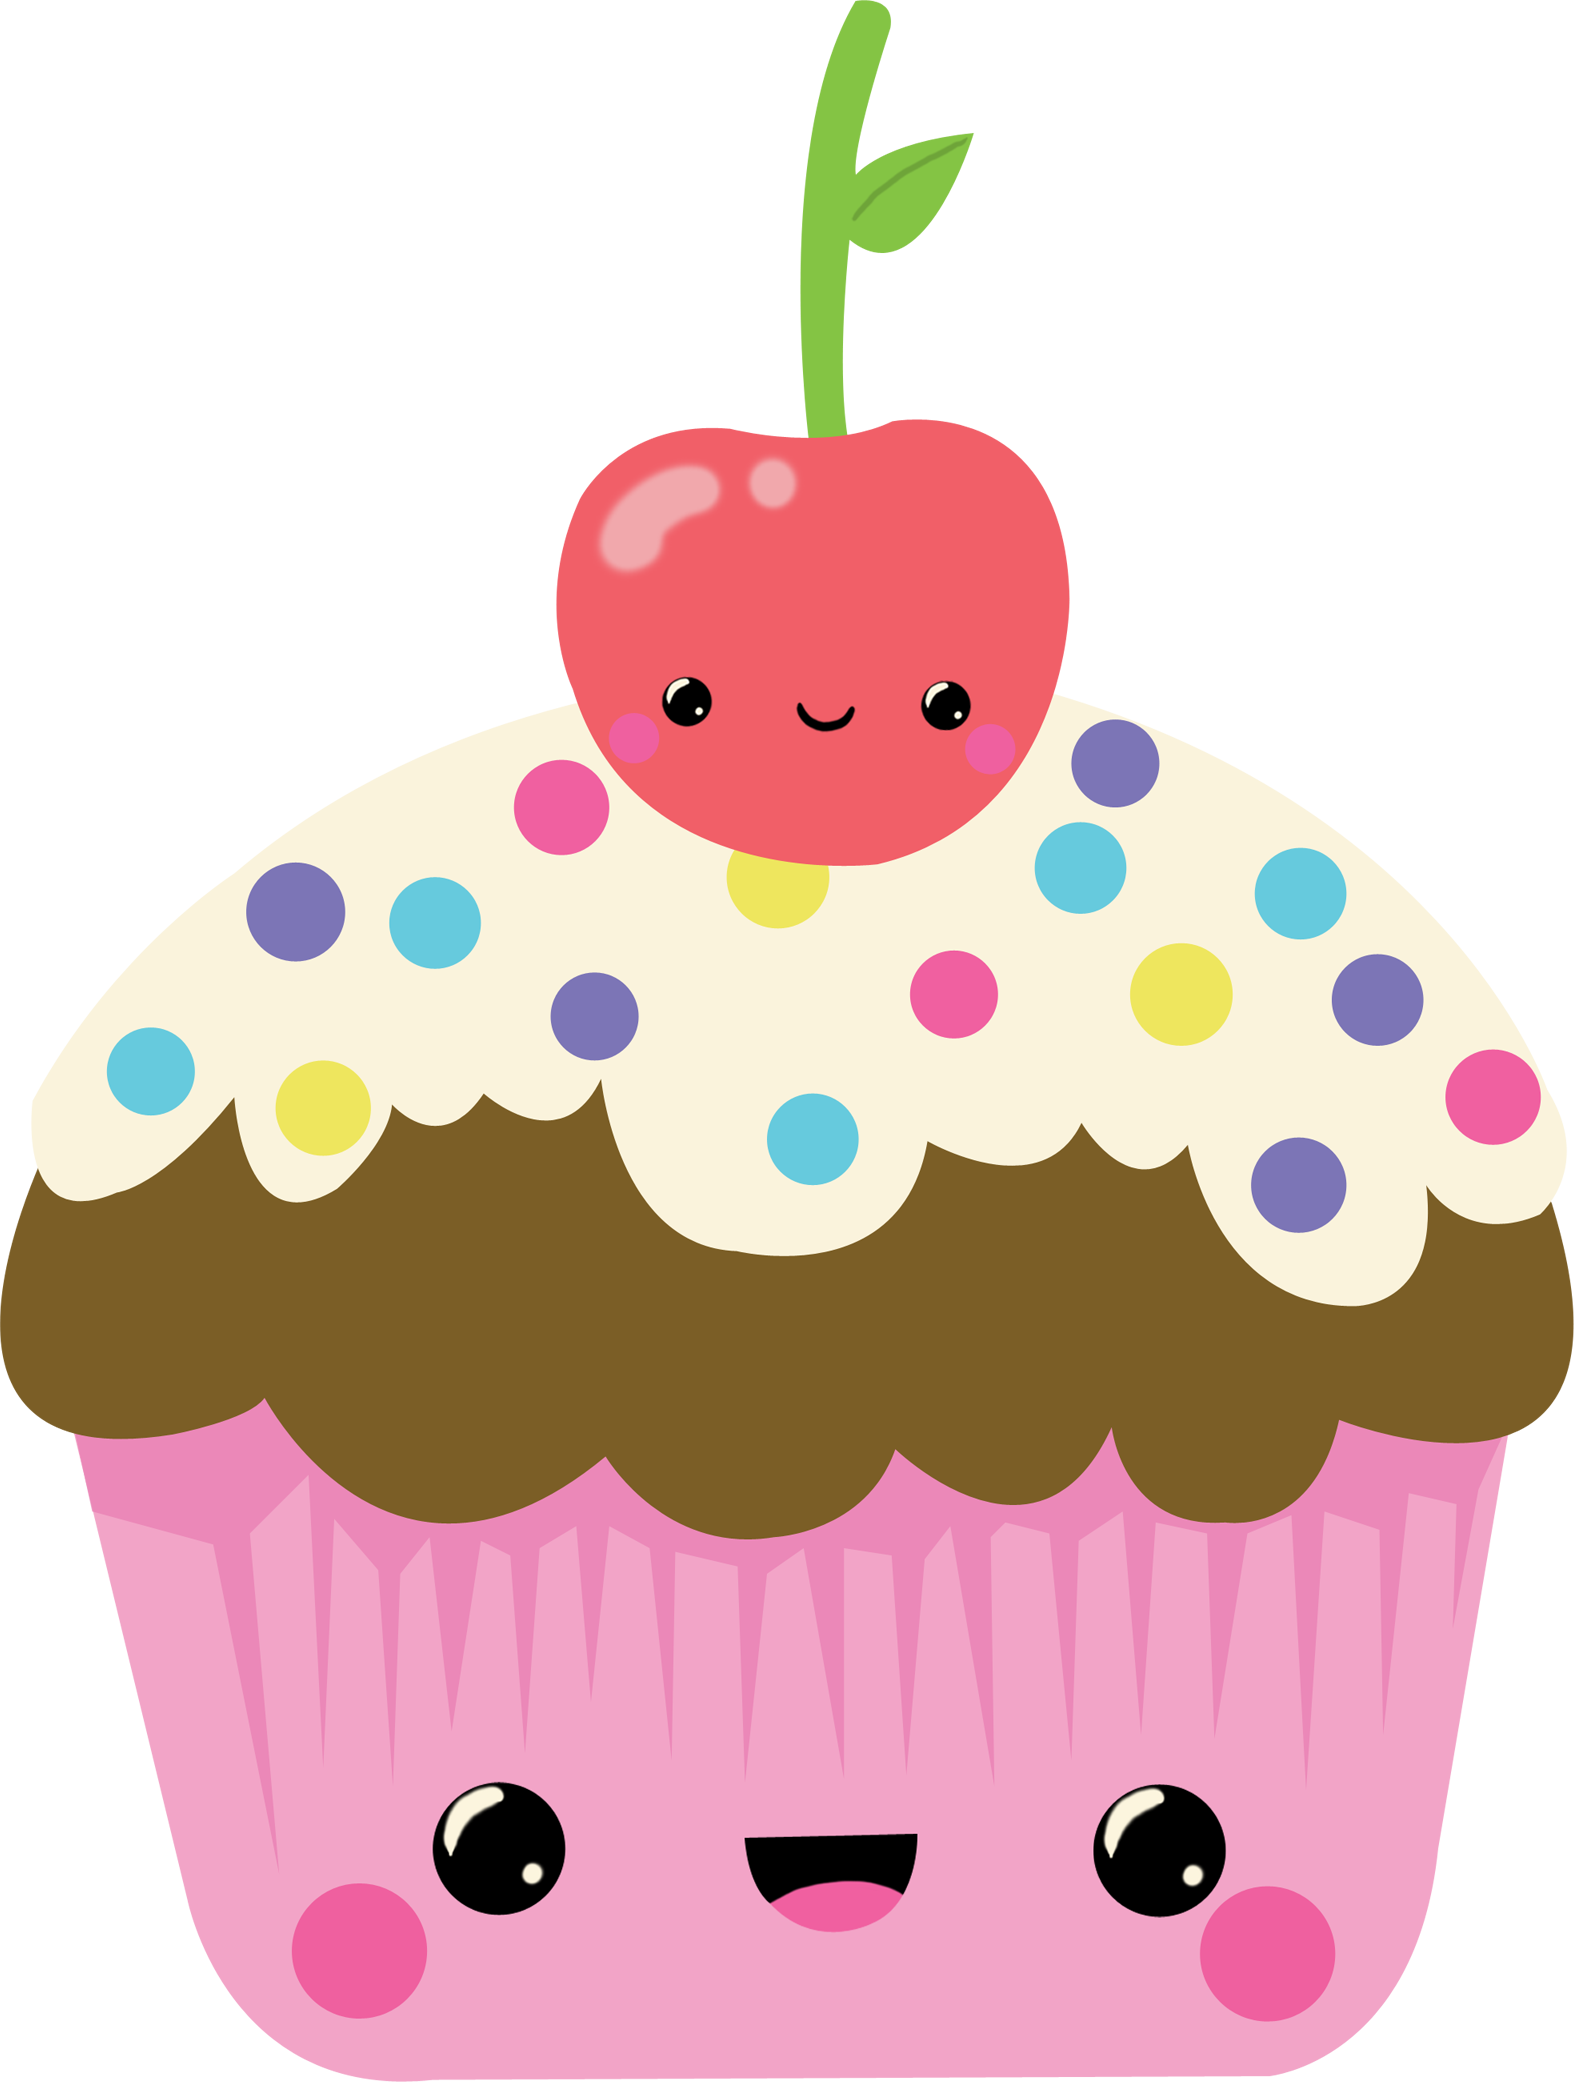 Kawaii clipart dessert. Cupkakr album on imgur